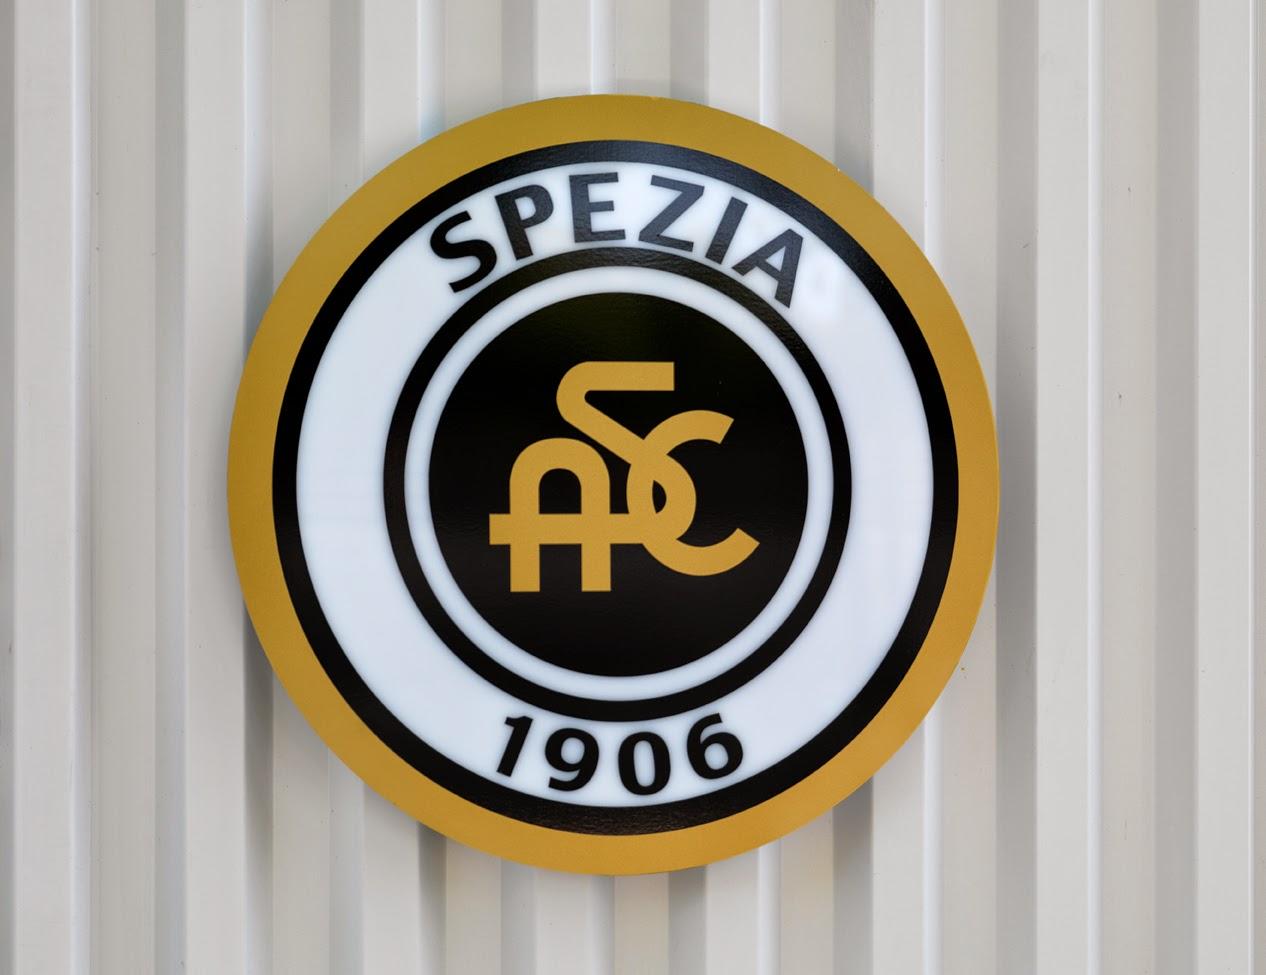 Calcio Wallpaper Lbj